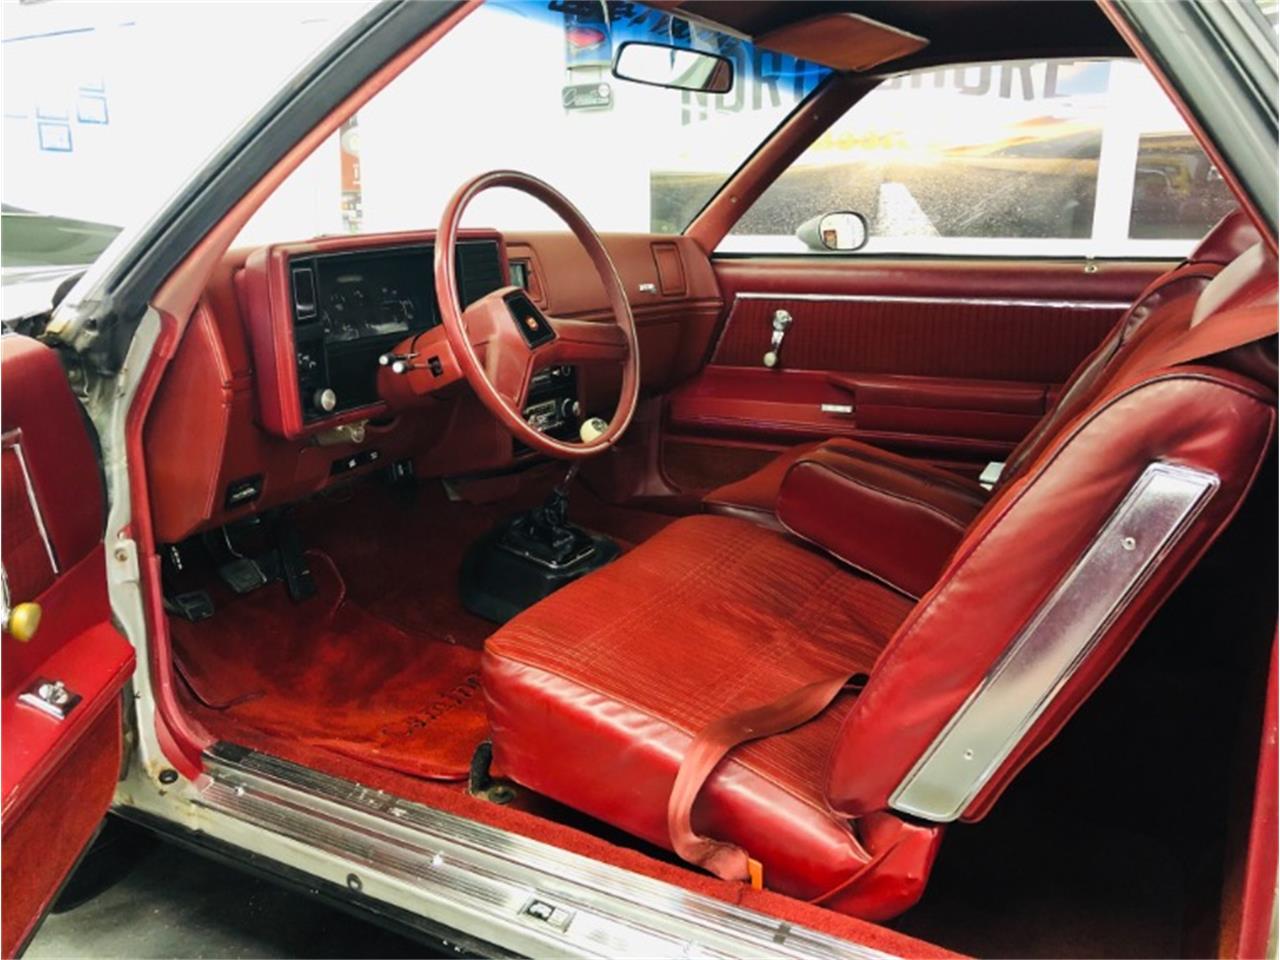 Large Picture of '79 El Camino located in Illinois - $17,550.00 - Q52Z